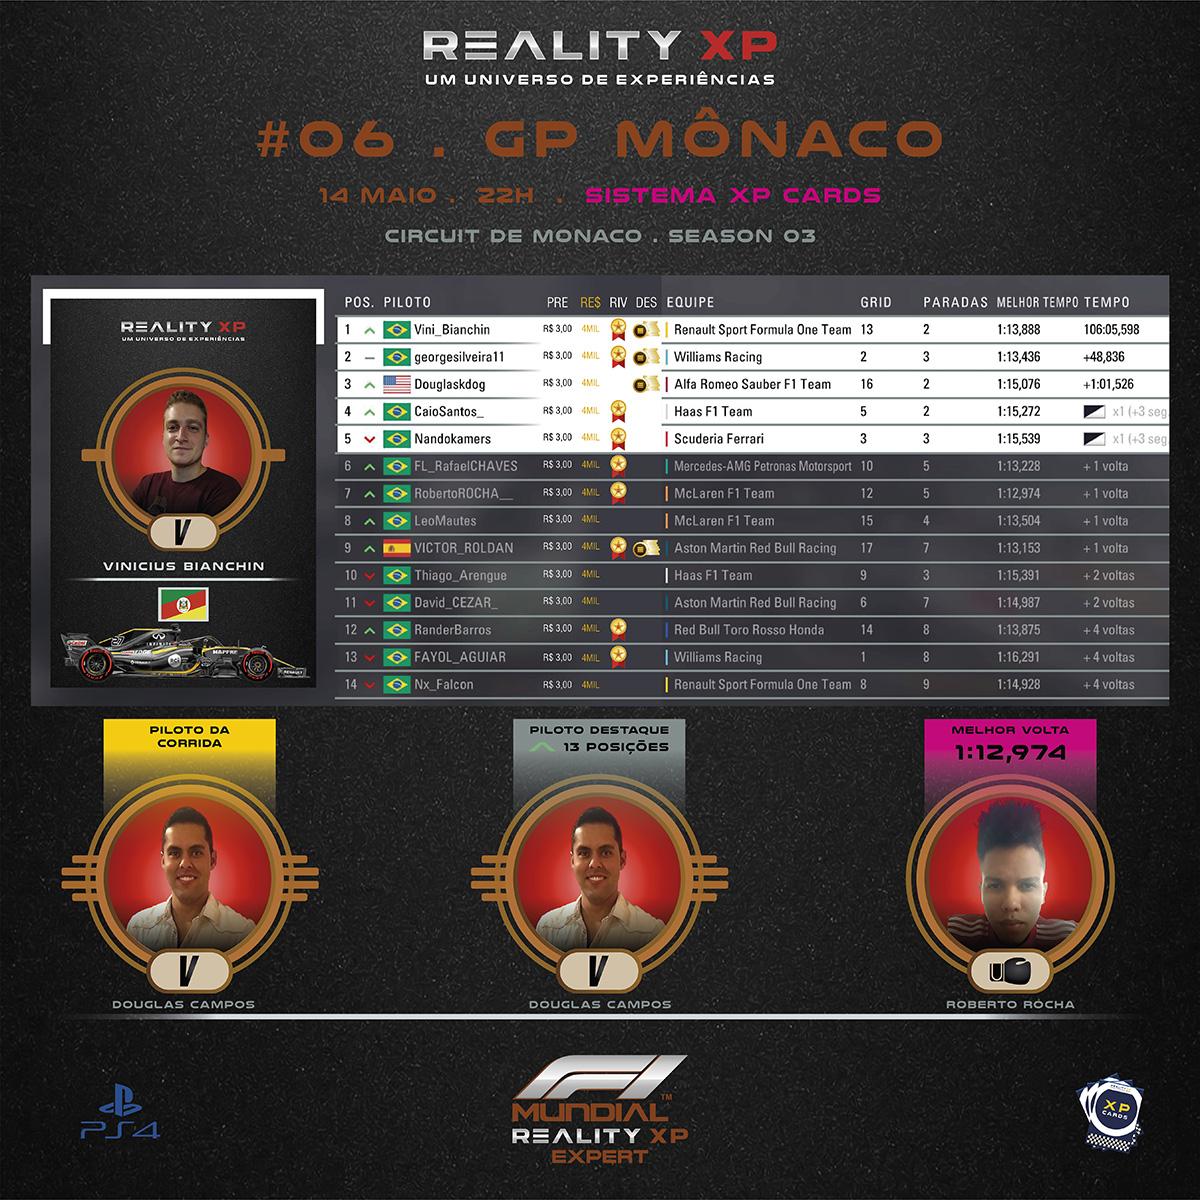 RealityXP_Mundial_RS_PS4_Expert_ETAPA_6_4